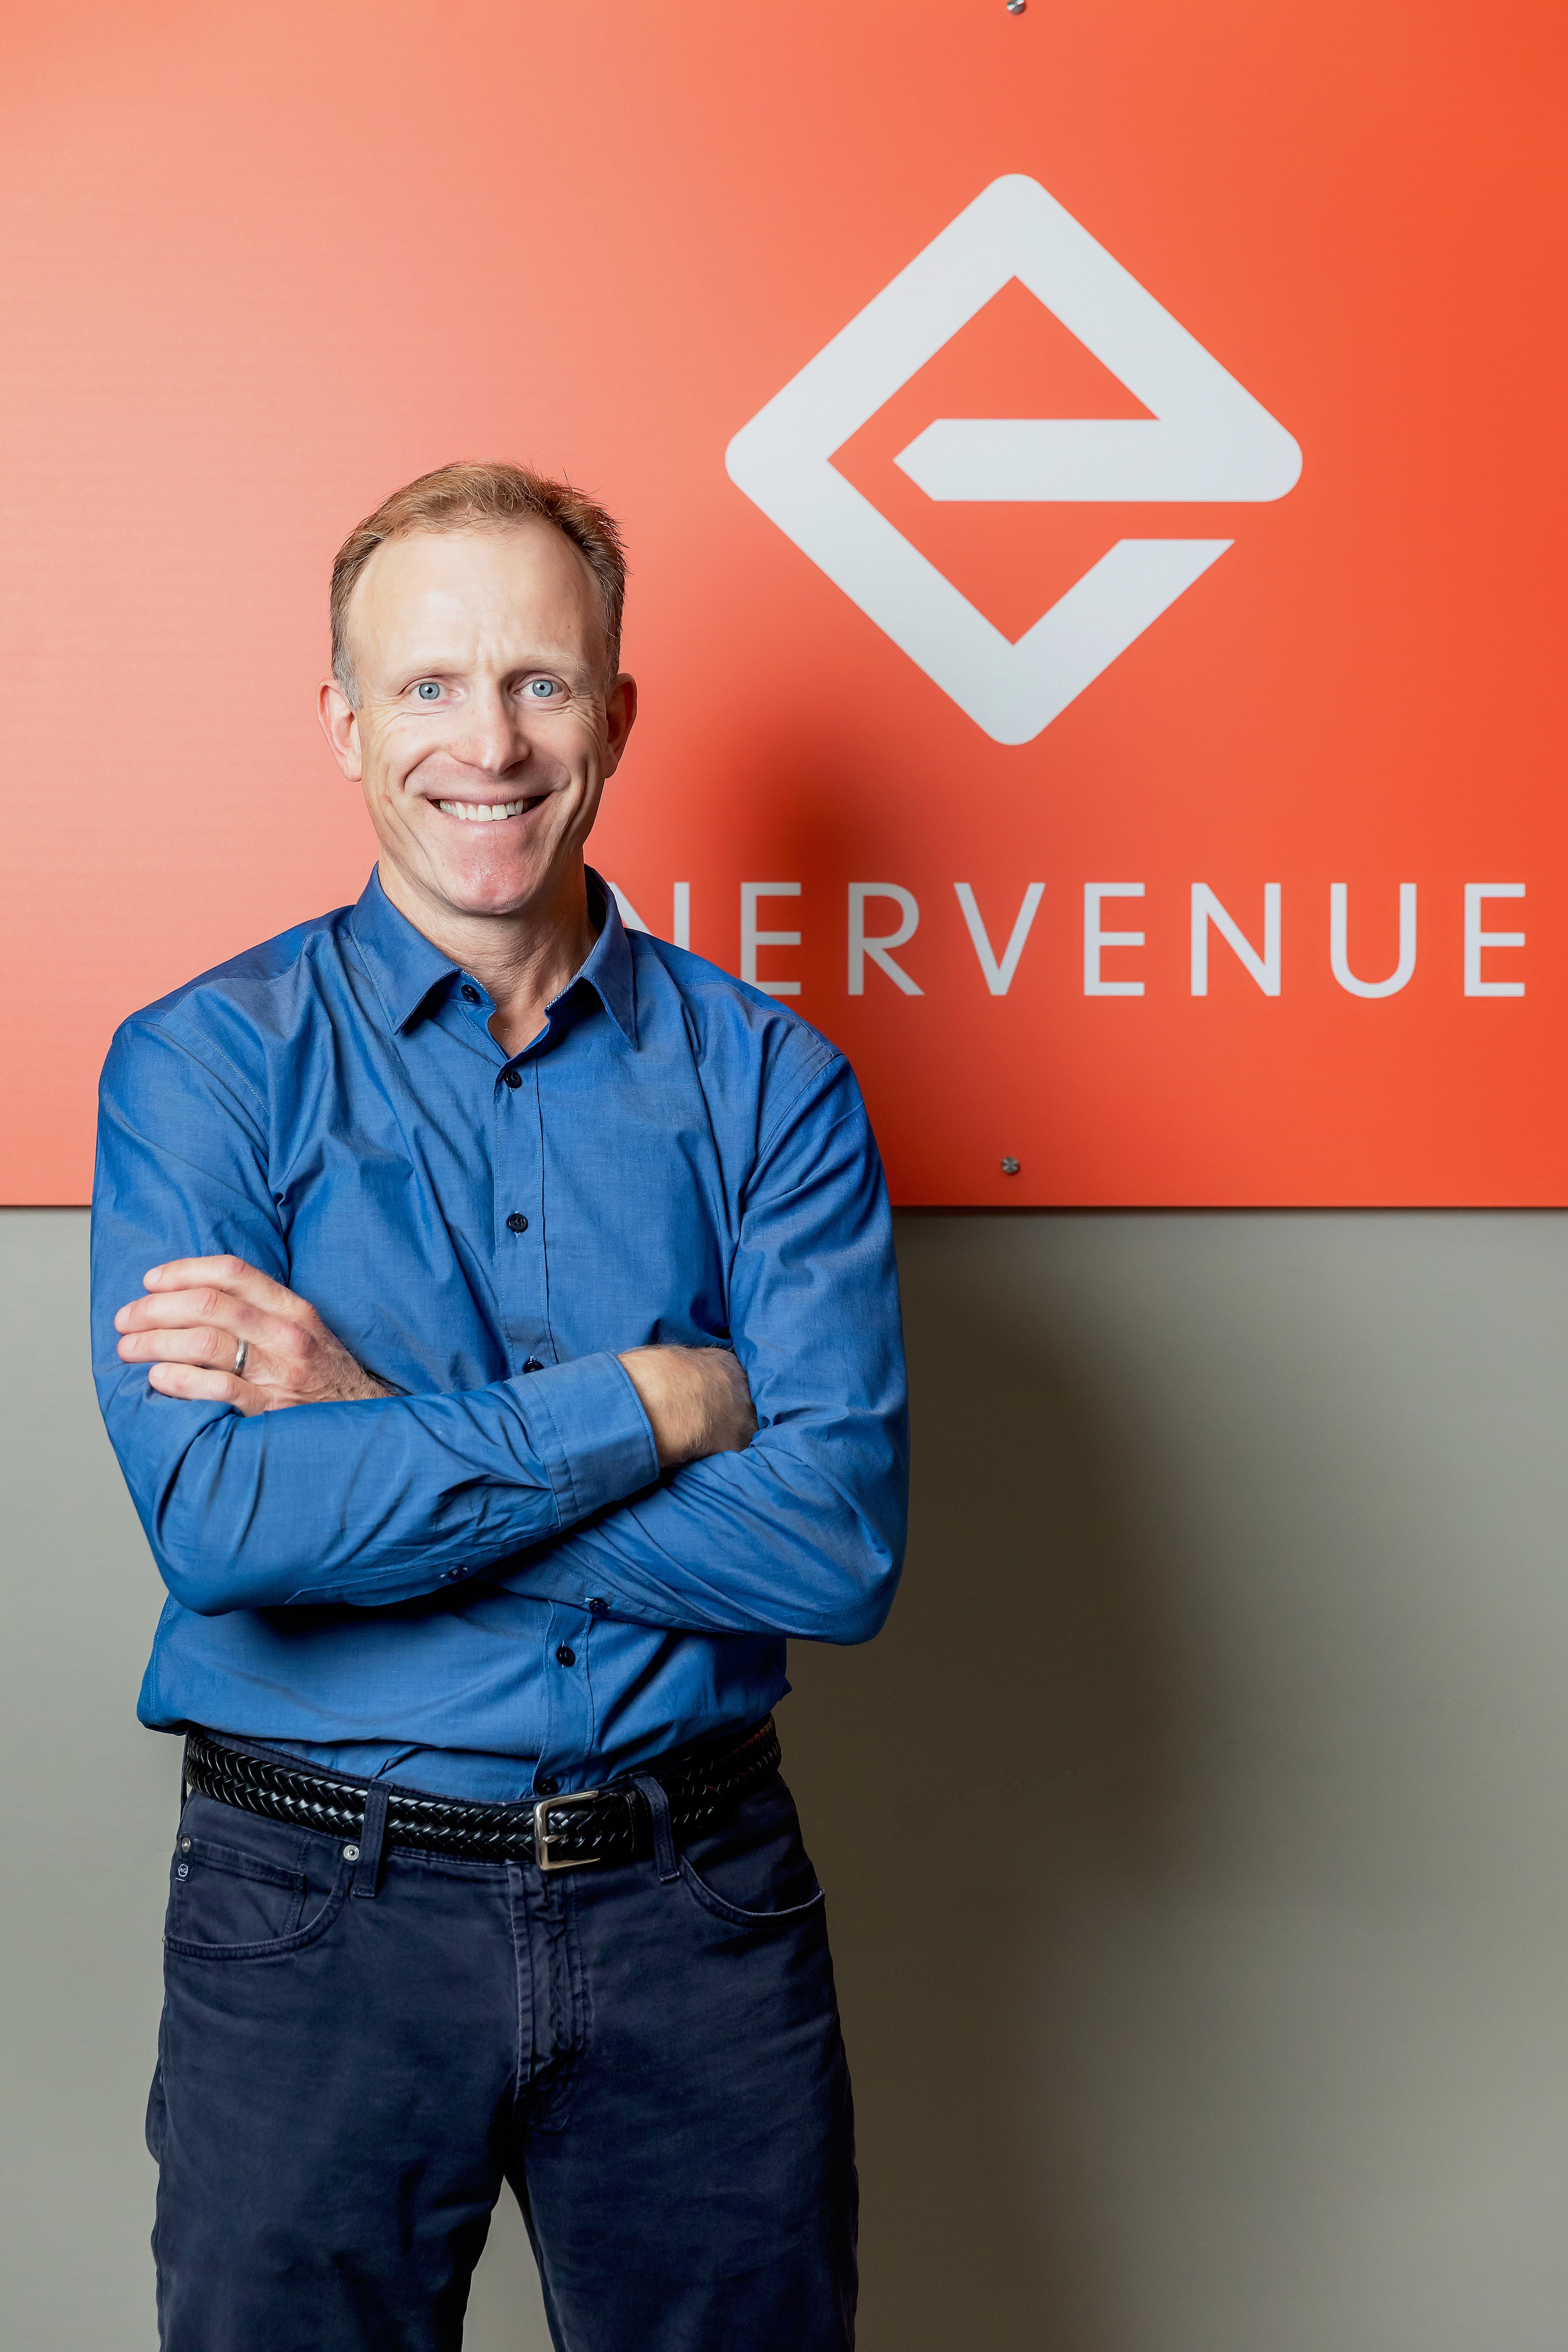 EnerVenue raises $100M to accelerate clean energy using nickel-hydrogen batteries